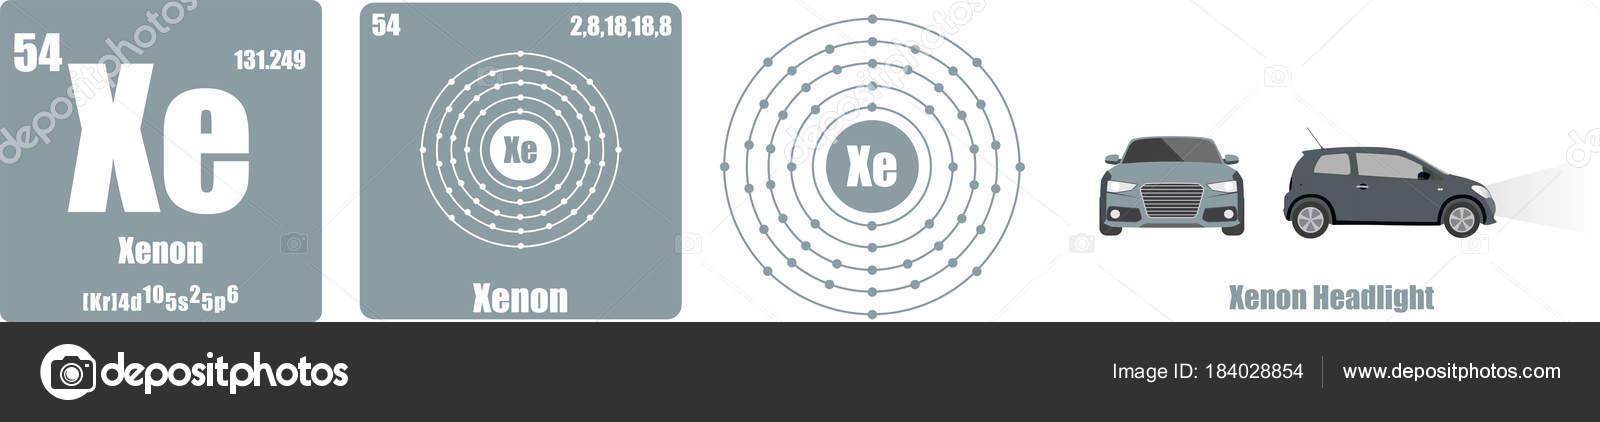 Tabla periodica los elemento del grupo viii los gases nobles tabla periodica los elemento del grupo viii los gases nobles vector de stock urtaz Choice Image